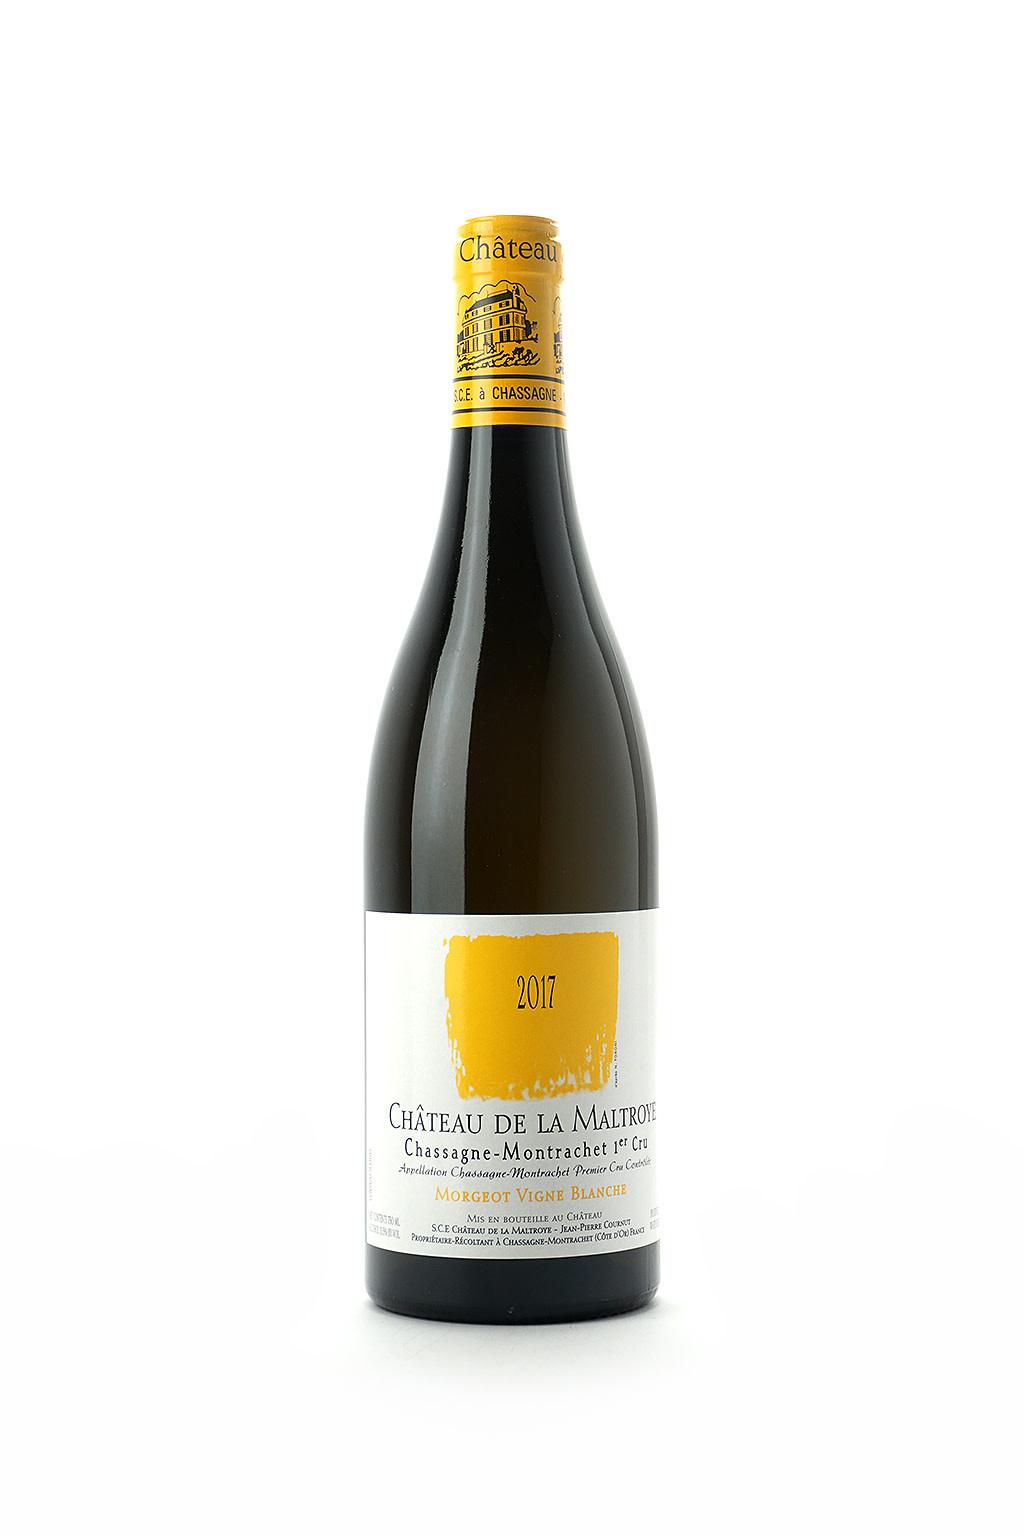 Chateau Maltroye Chassagne-Montrachet 1er Cru Morgeot Vigne Blanche 2017